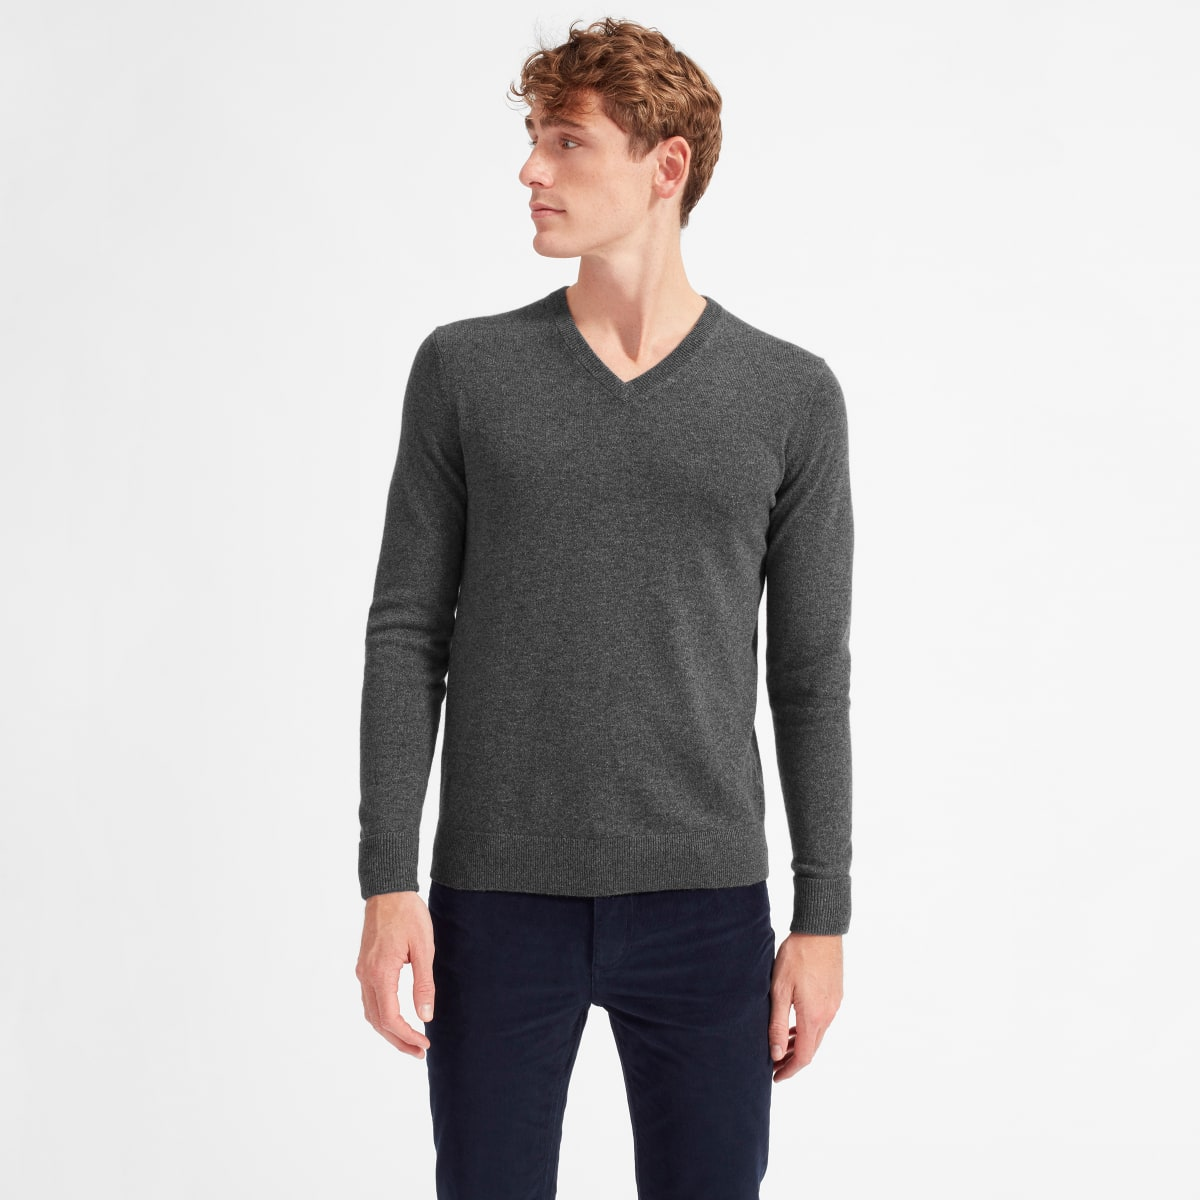 Everlane cashmere v-neck, men's cashmere, cashmere sweaters